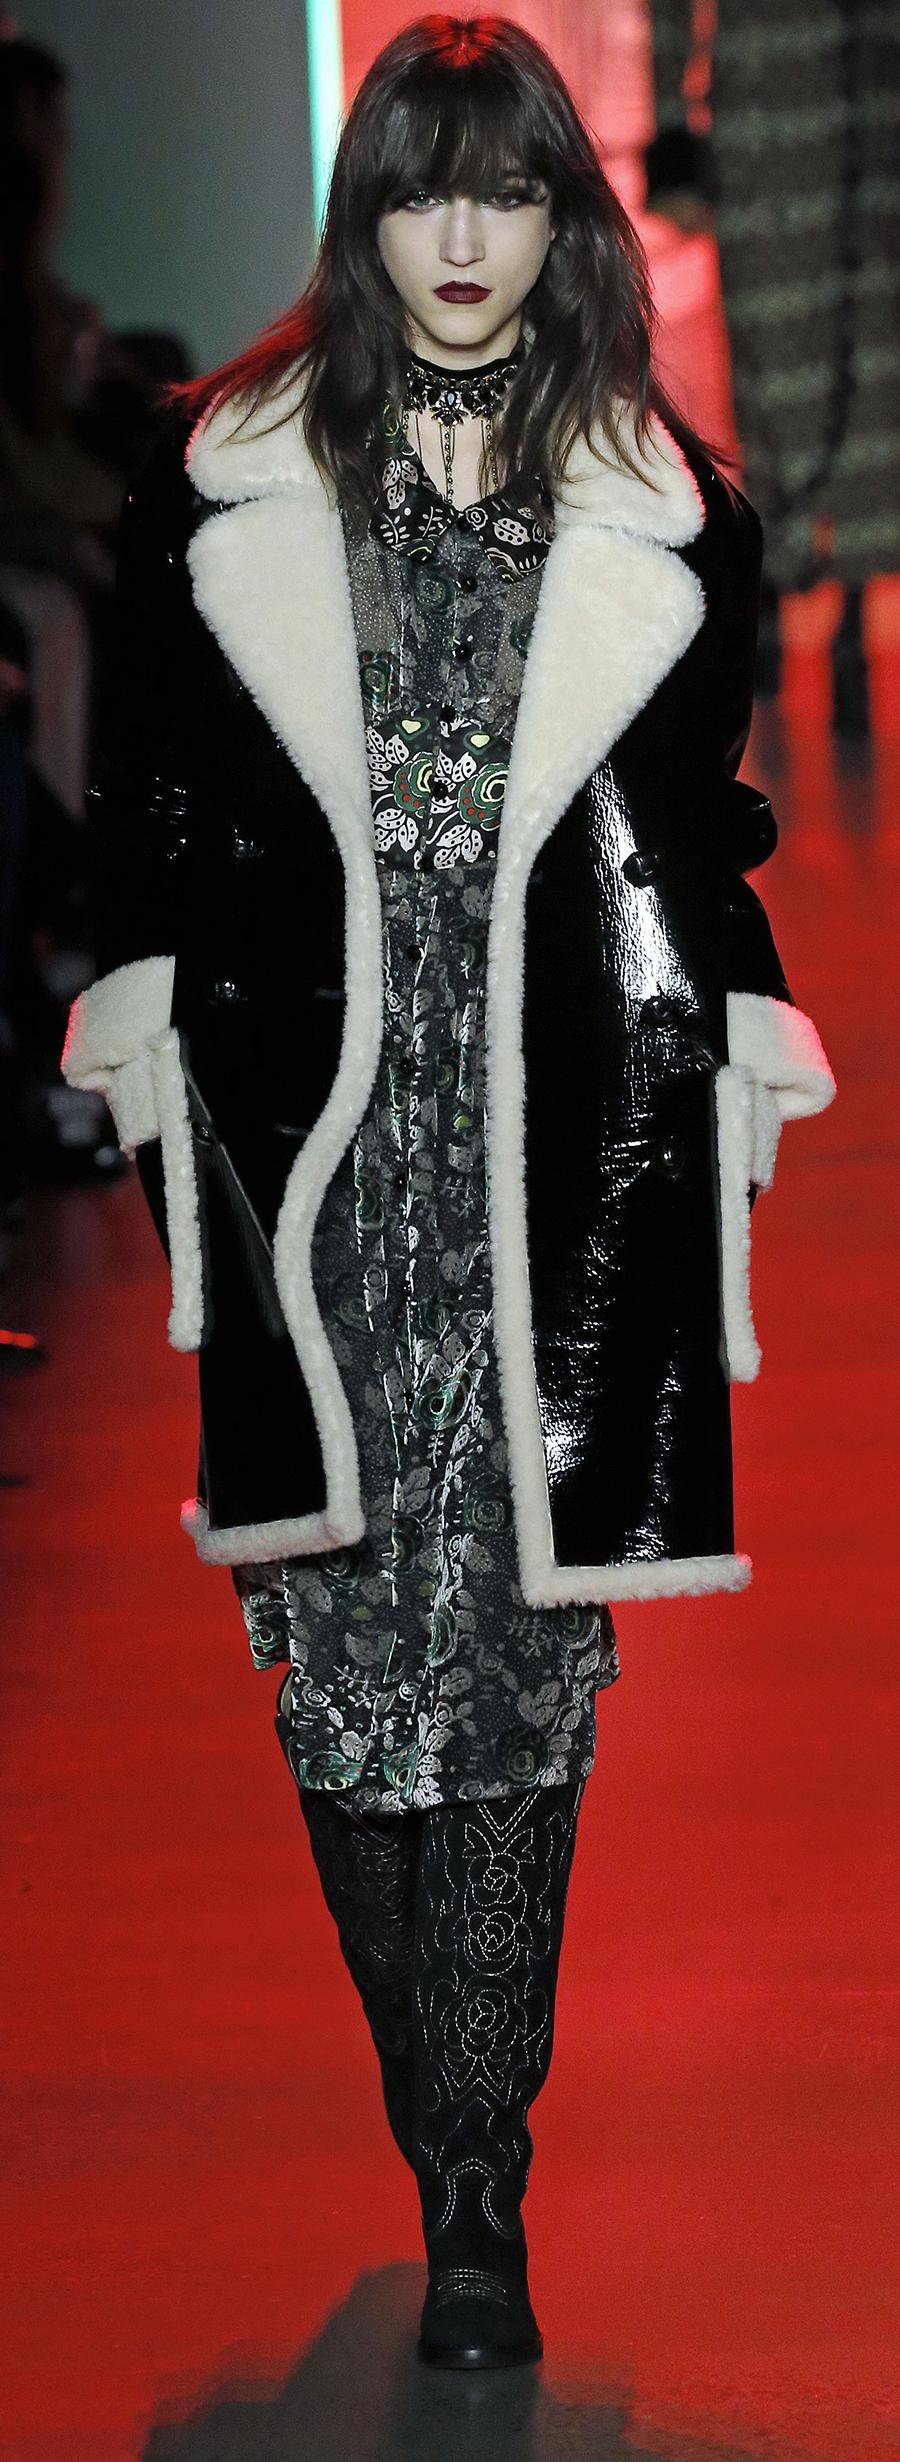 модная дубленка осень зима 2020 2021 черная белая блестящая лаковая